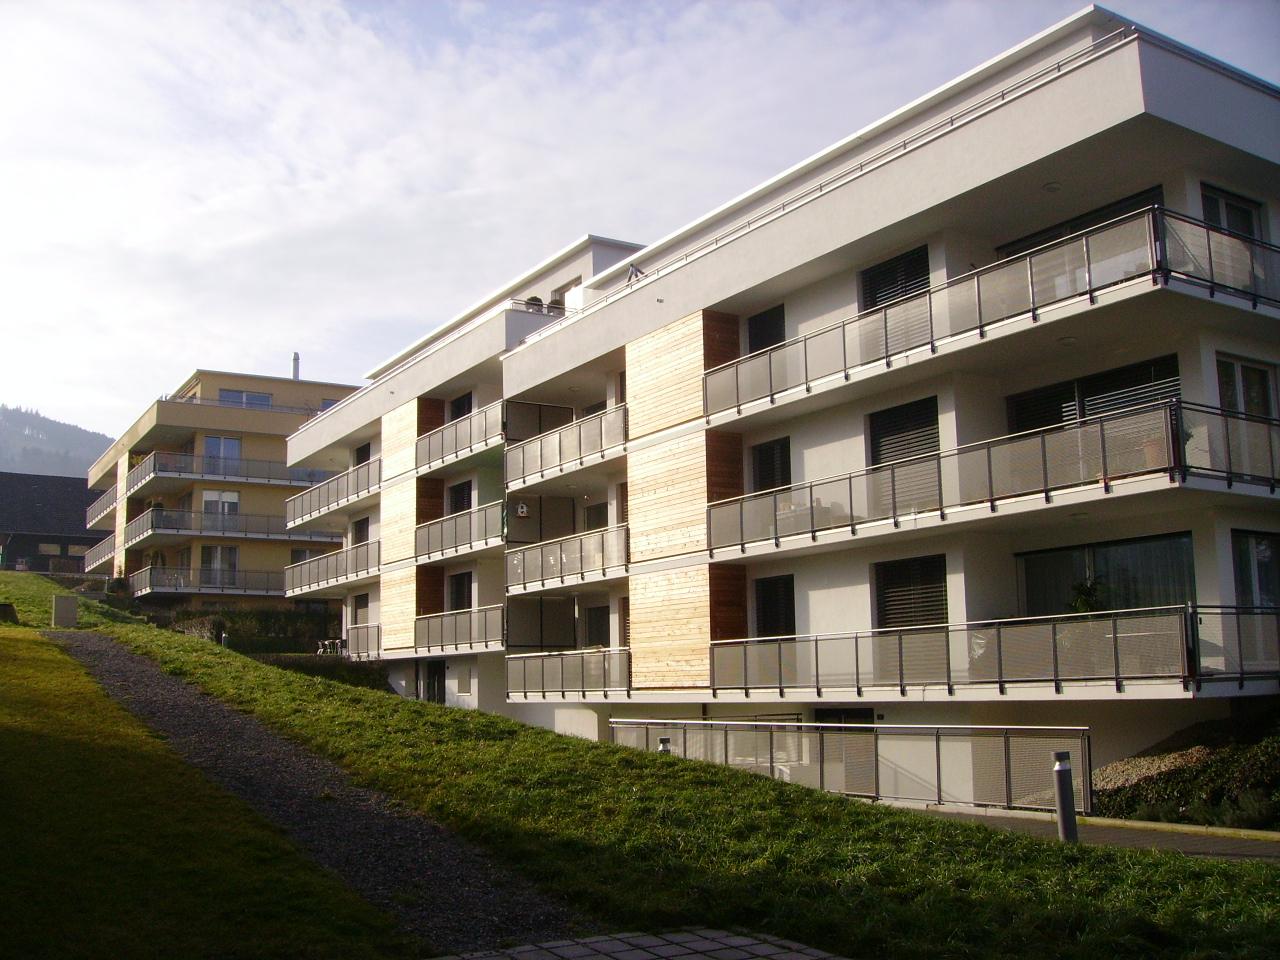 Rosengarten 5